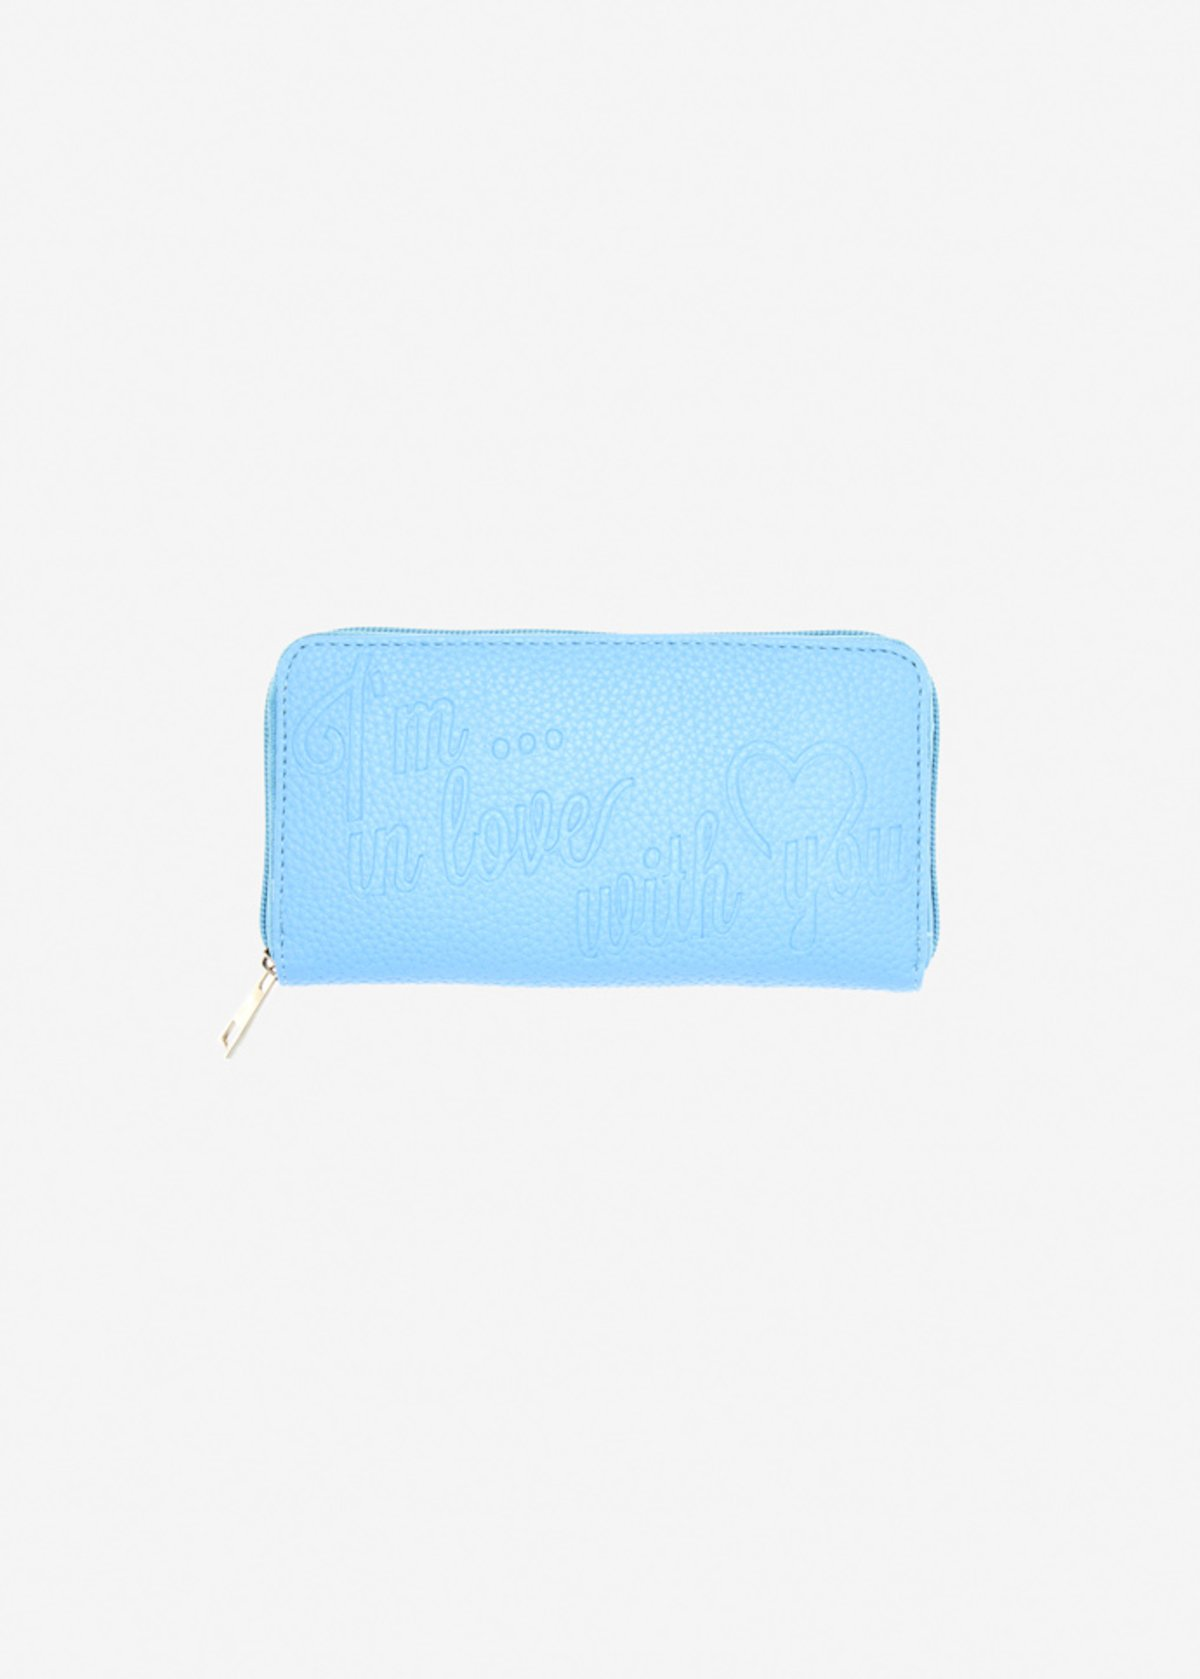 Wallet Prisco soft shades - Morning